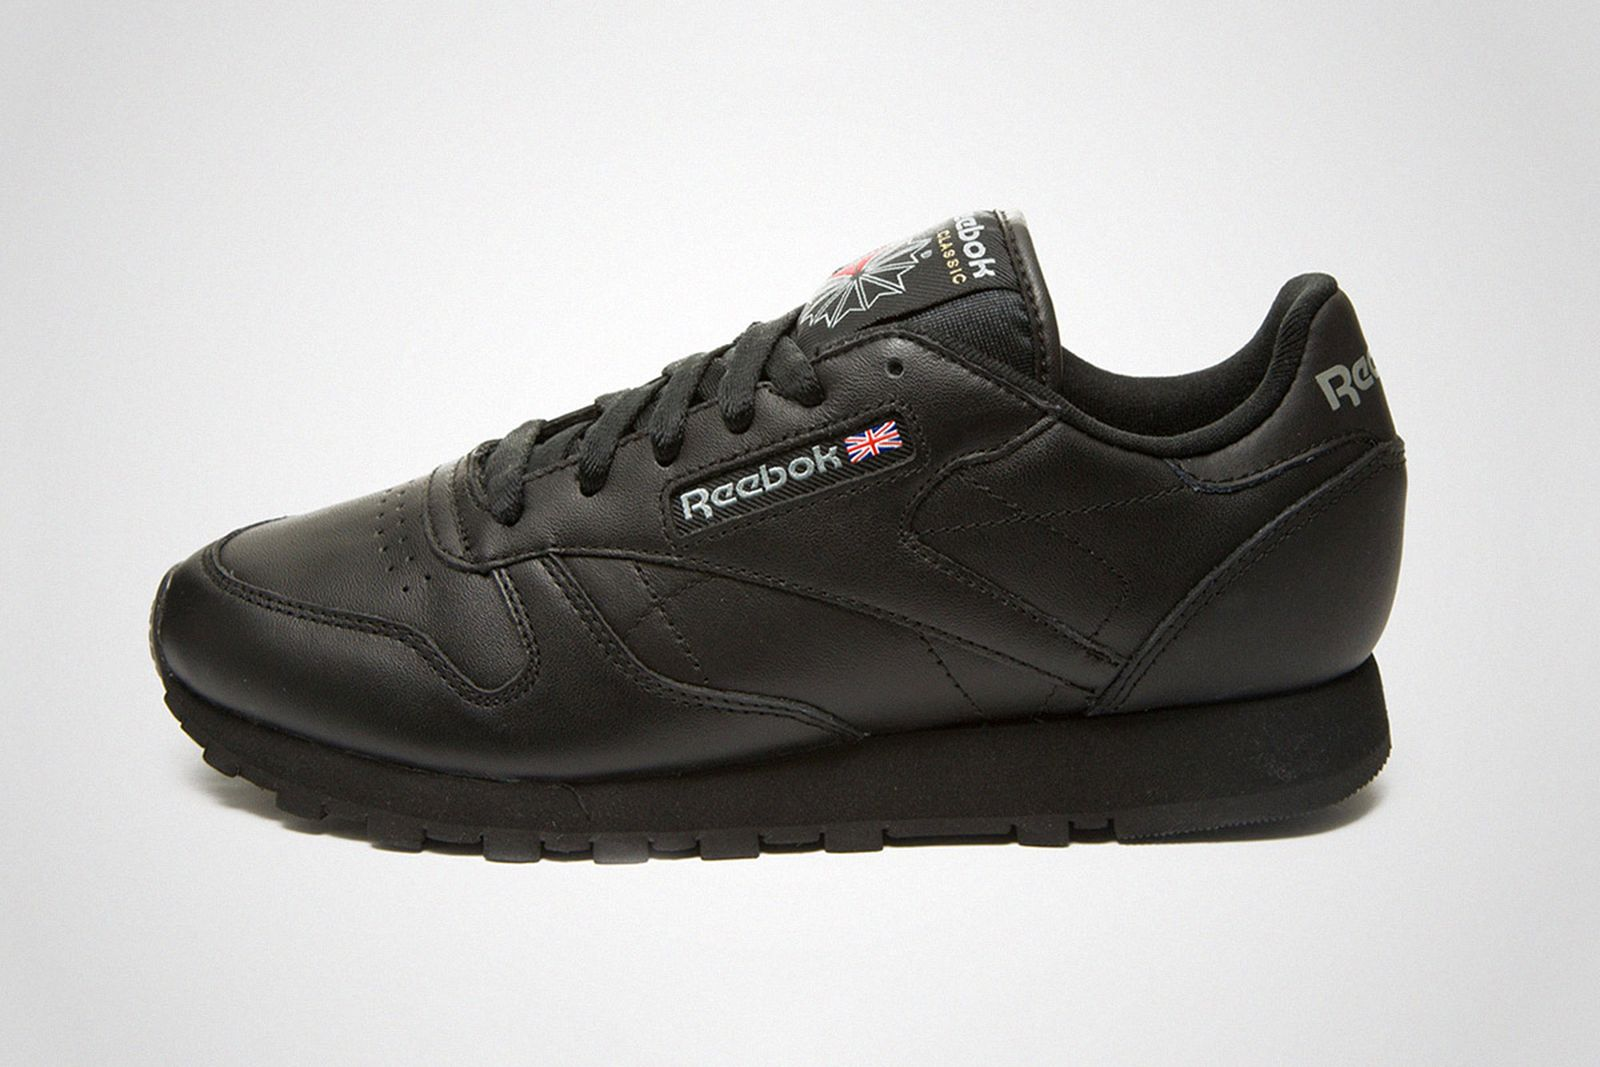 grime sneakers fashion reebokclassic Adidas Nike